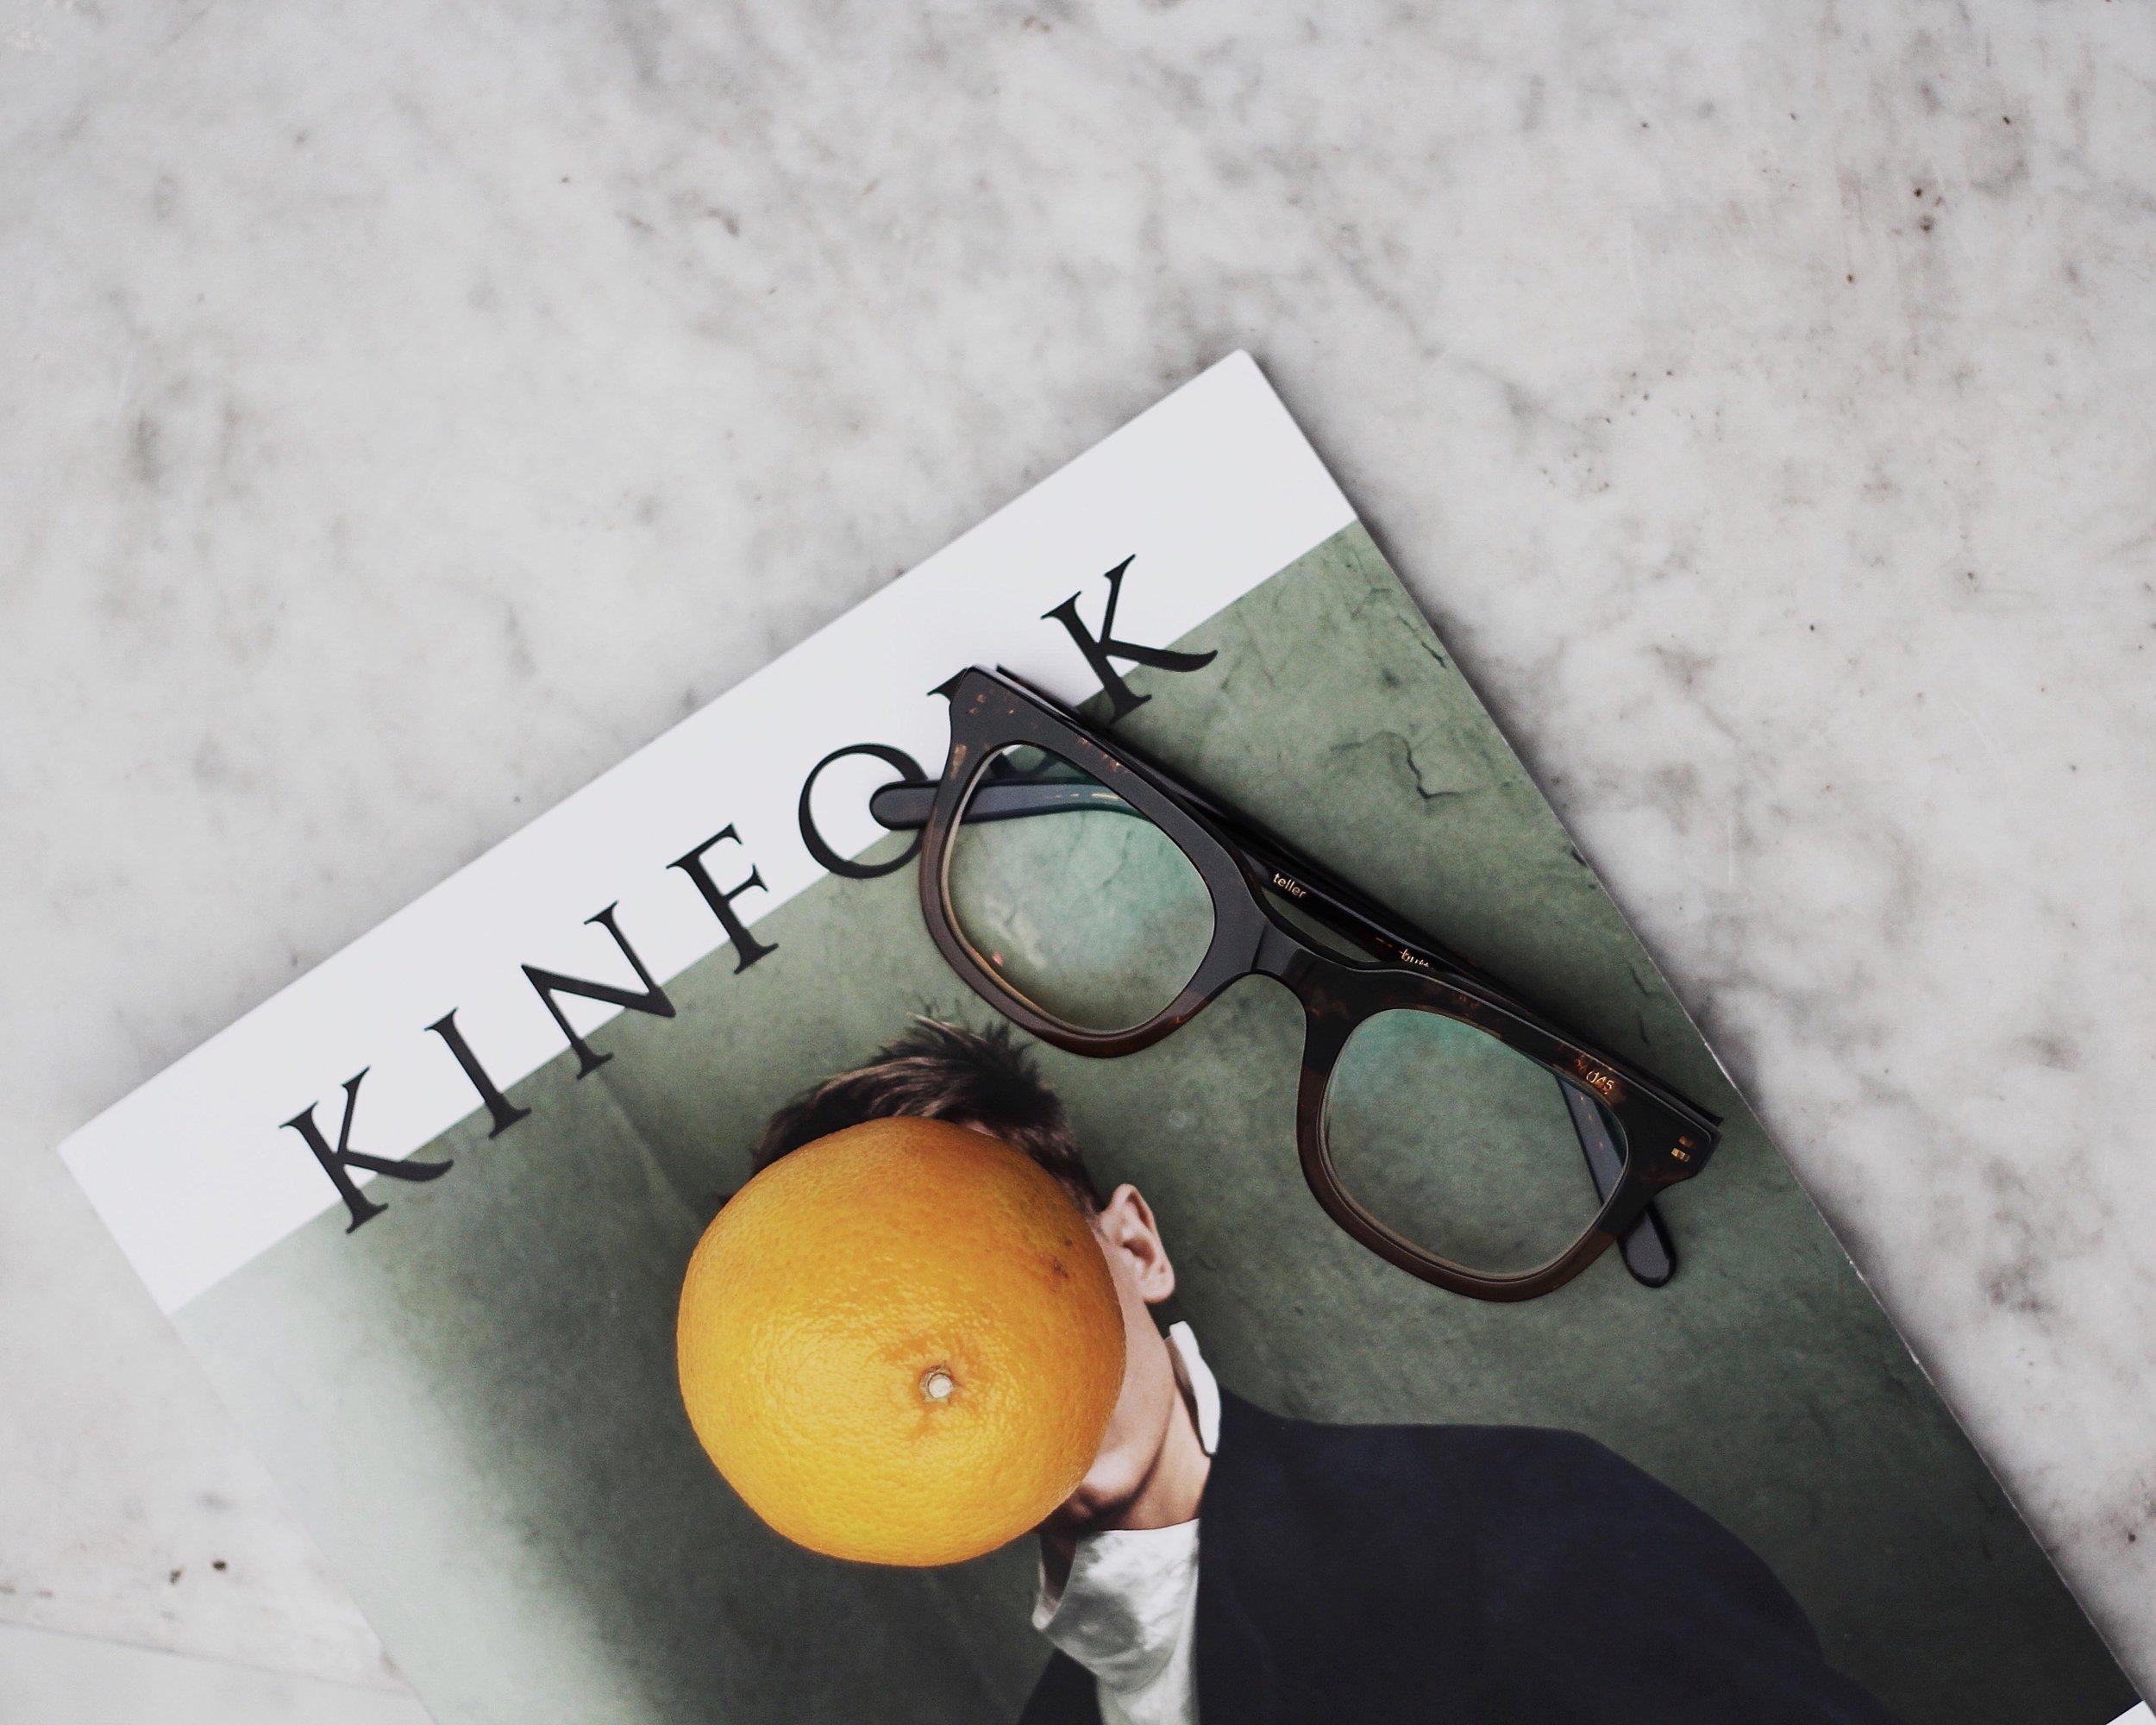 kinfol_aceandtate_glasses